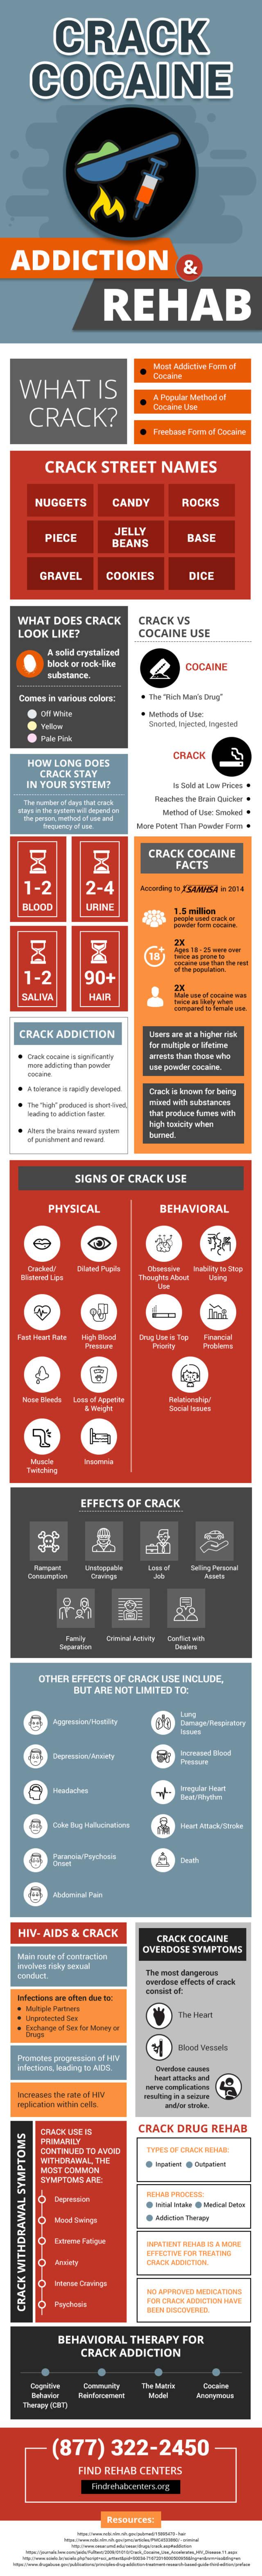 Crack cocaine addiction rehab infographic